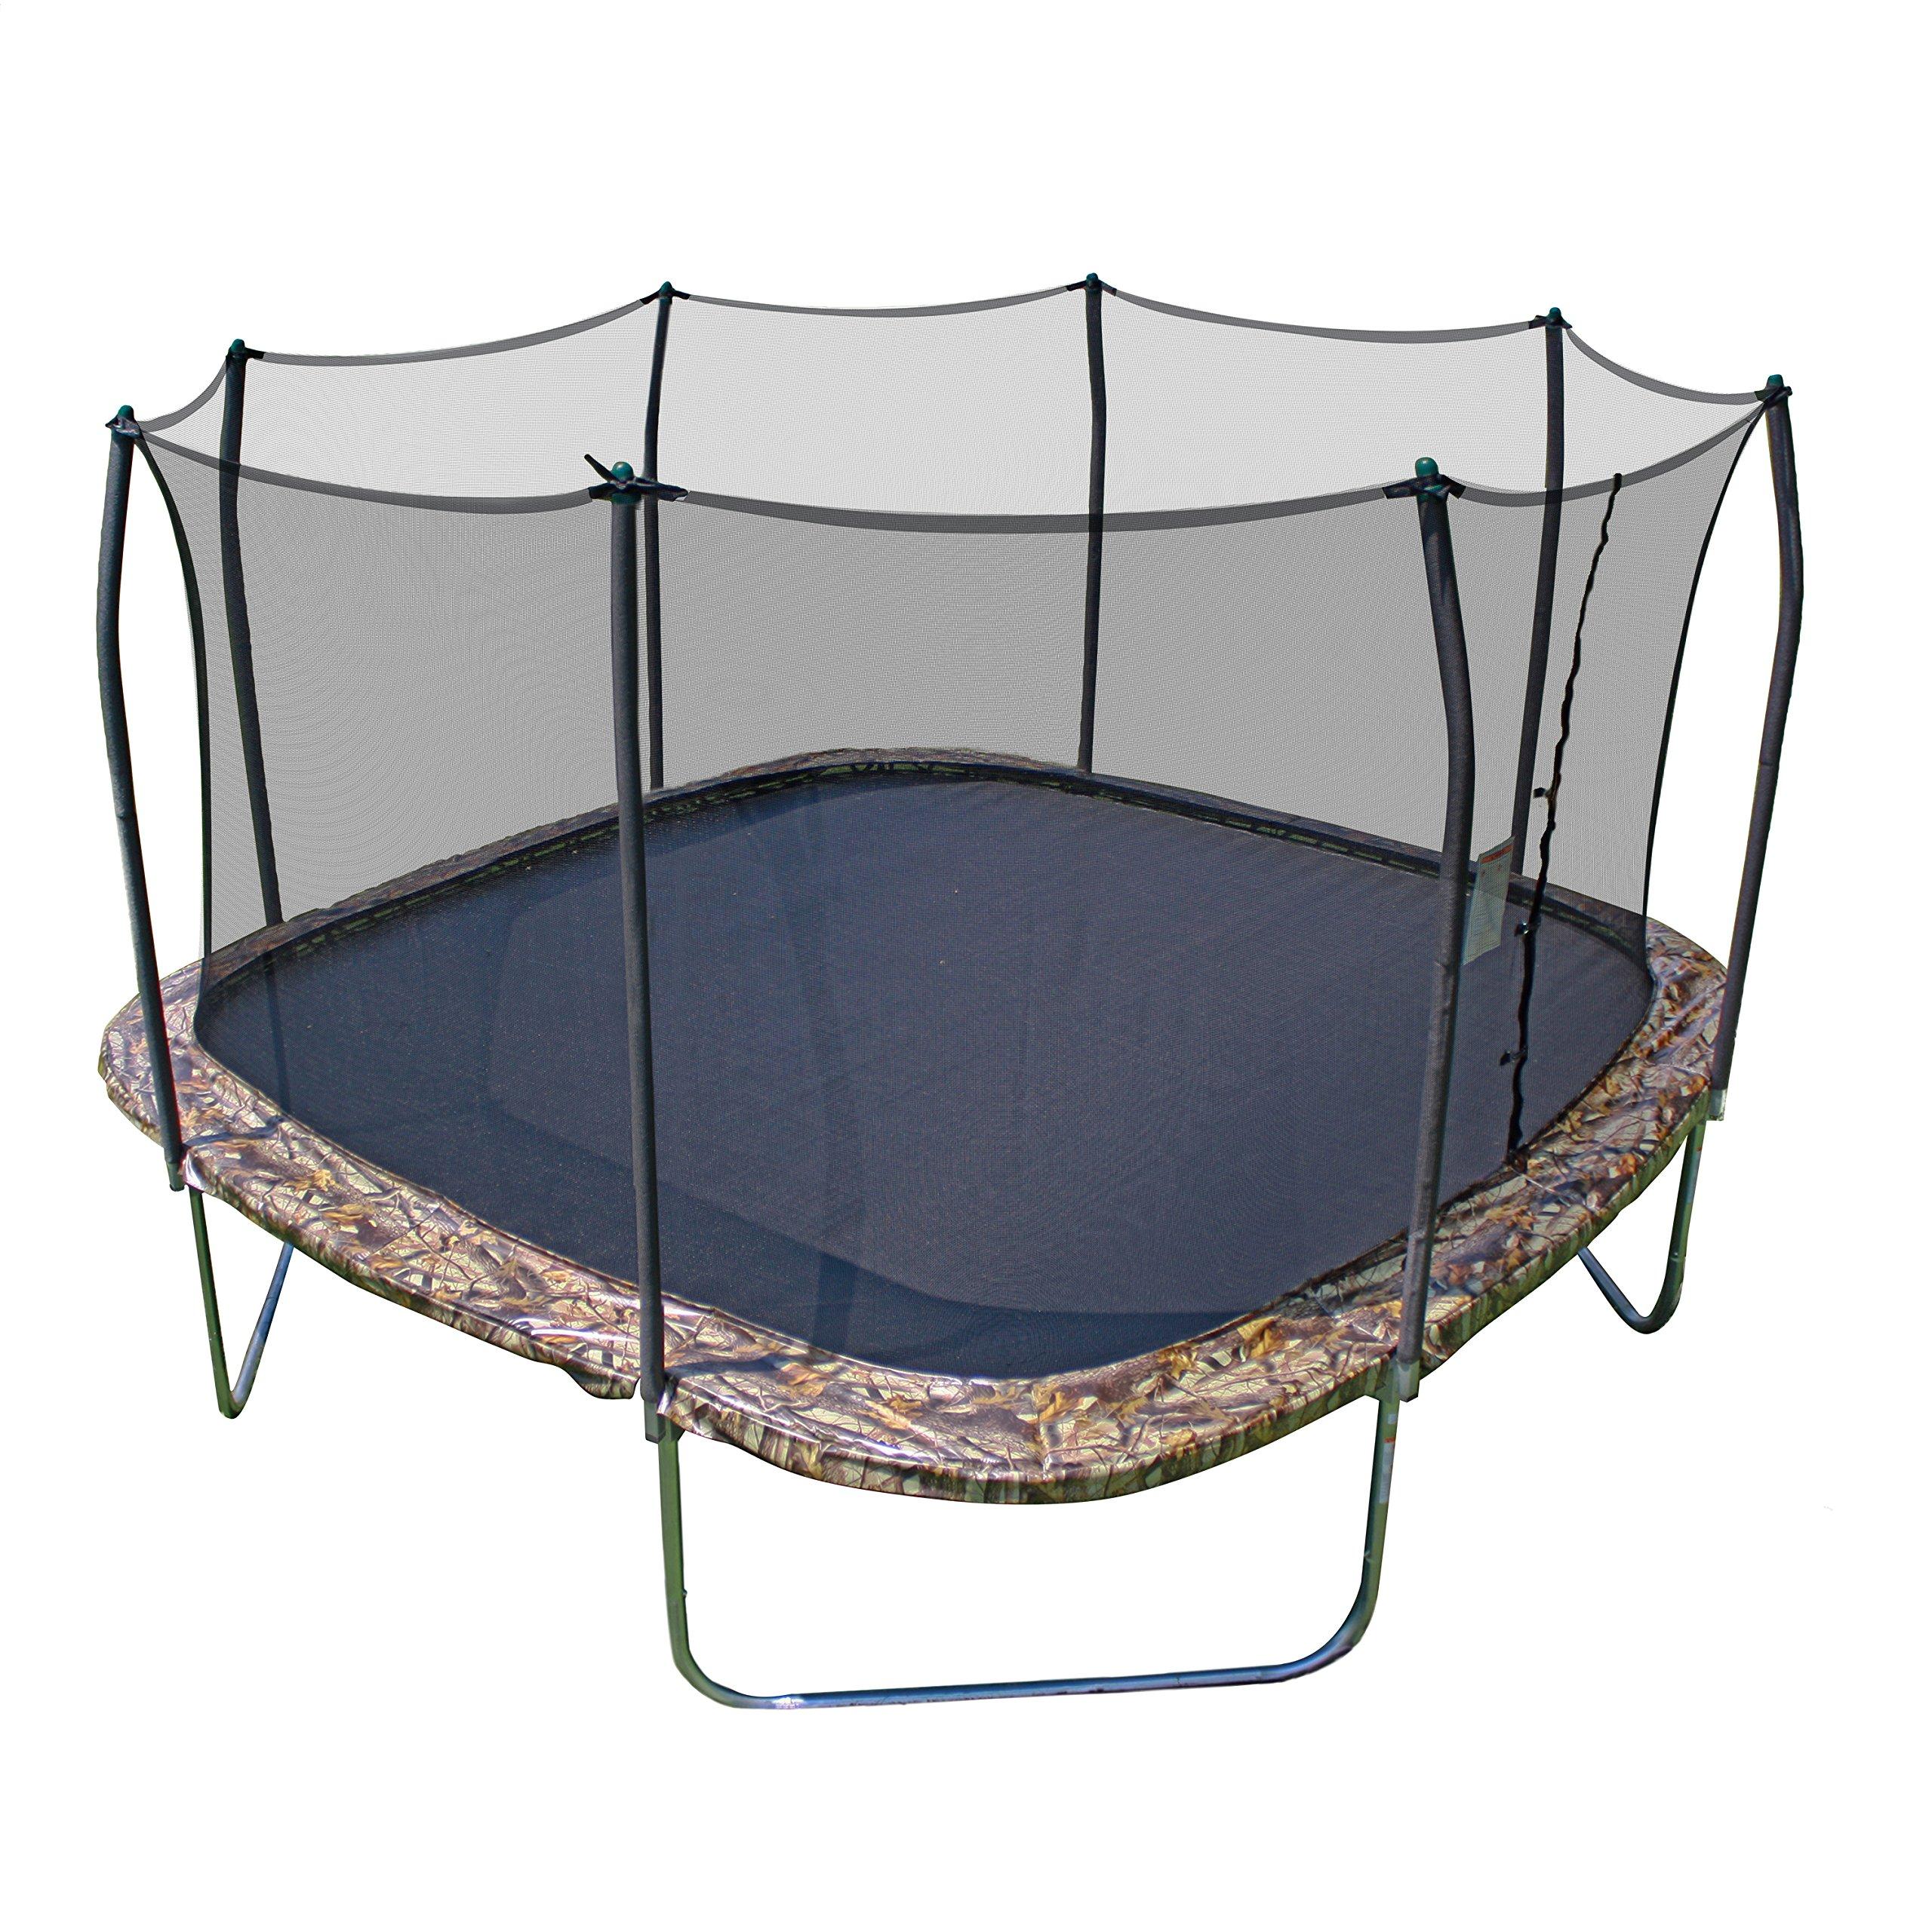 Skywalker Trampolines 14' Square Trampoline with Enclosure – Camo